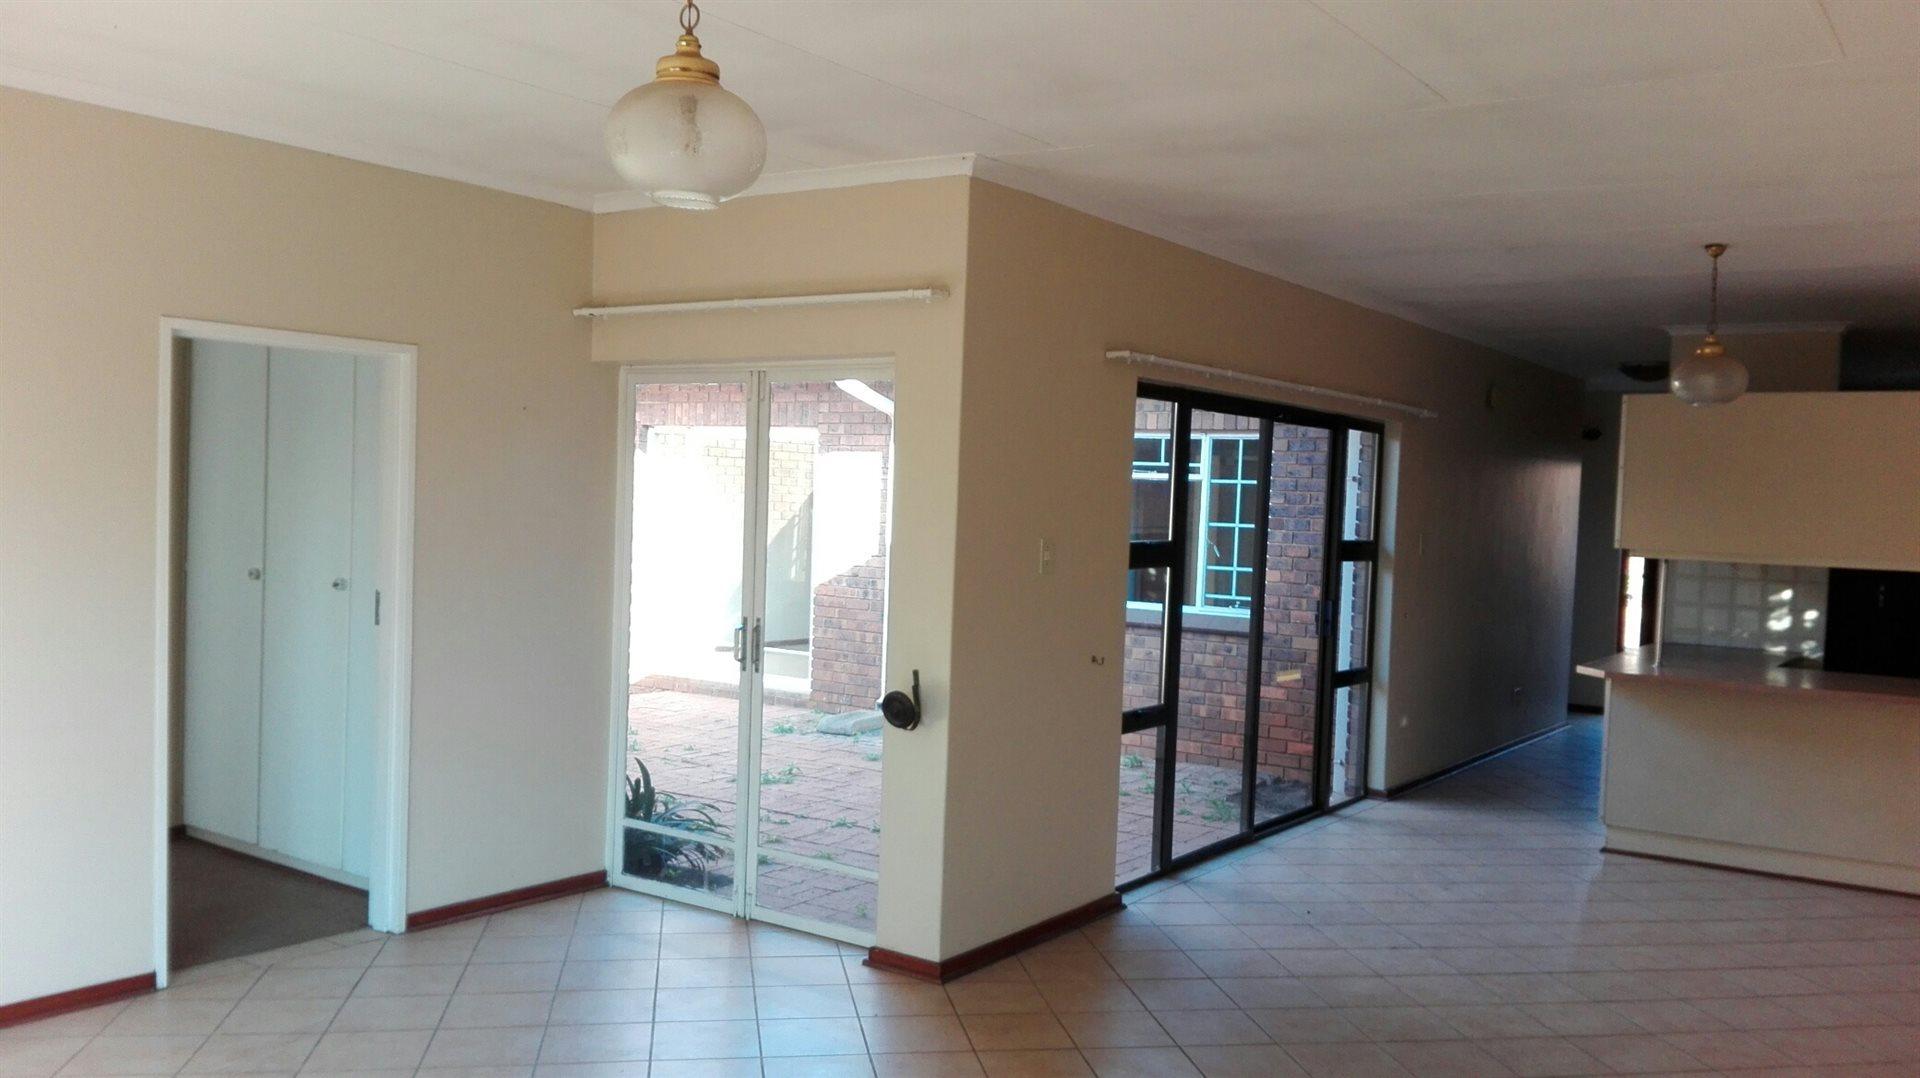 Zwartkop property for sale. Ref No: 13521136. Picture no 6